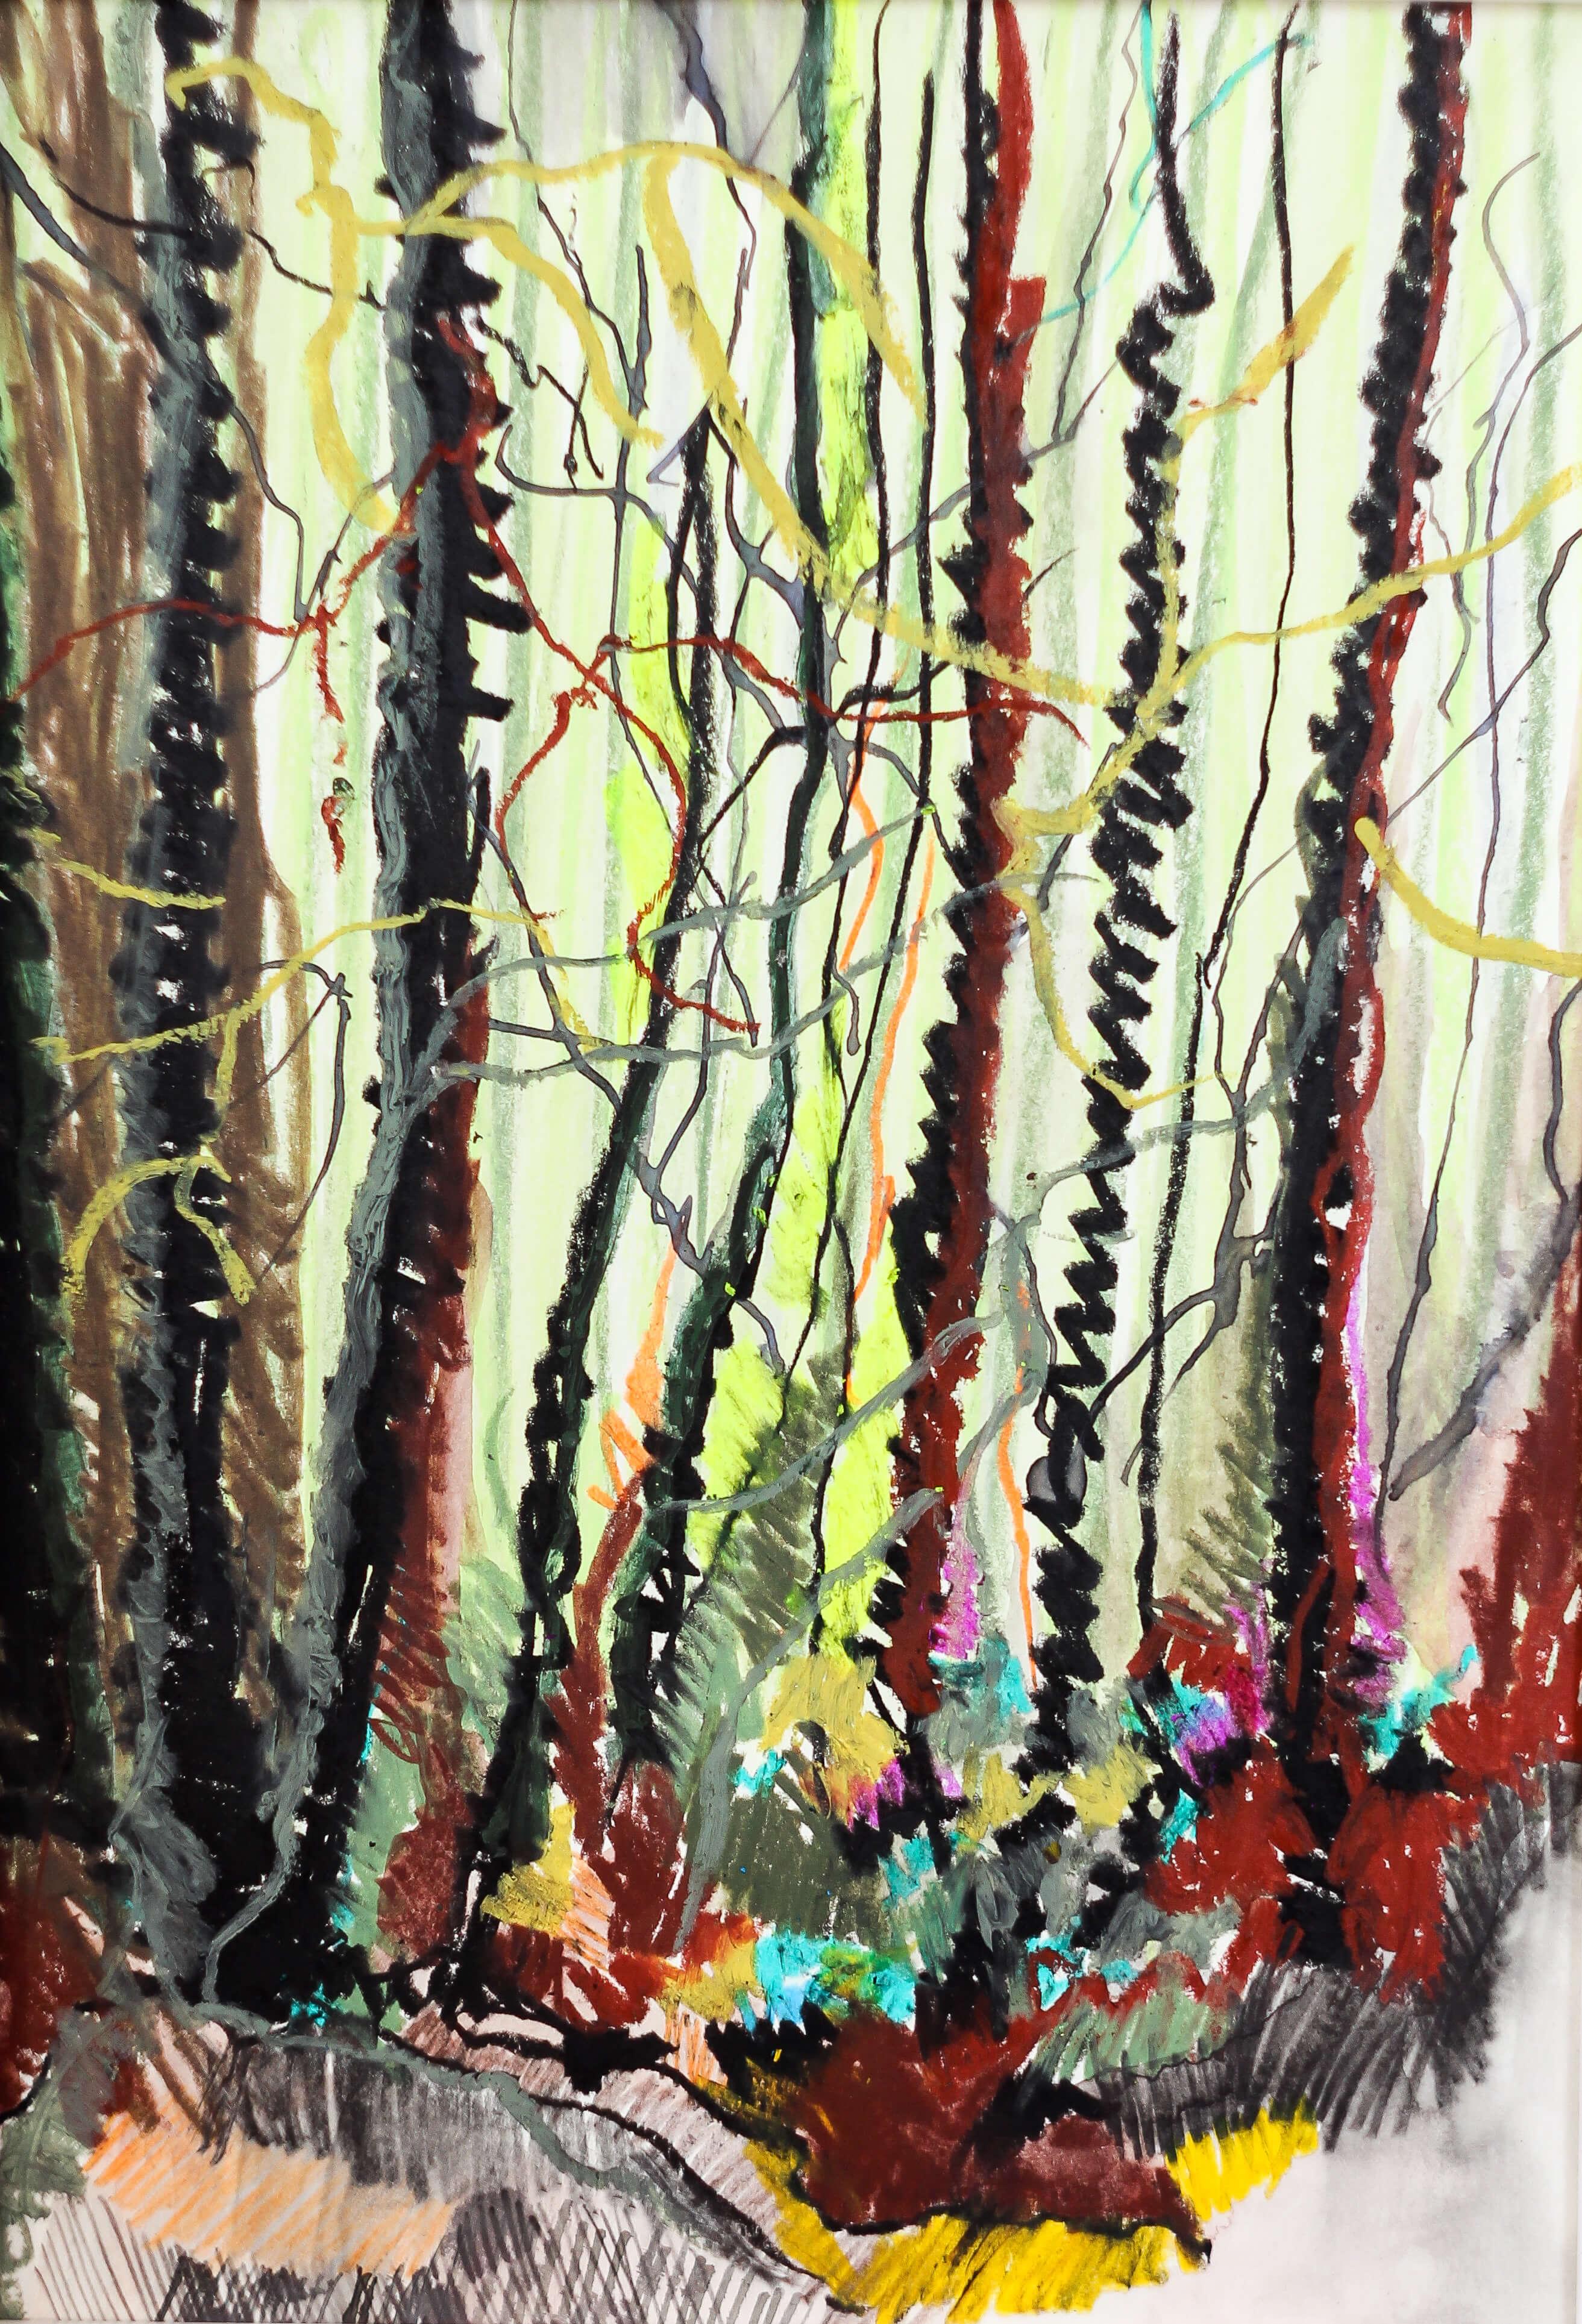 Katharina Albers, Wald II, 2014, Ölkreide, Tusche, Aquarell, Graphit auf Papier, 29,7×21 cm